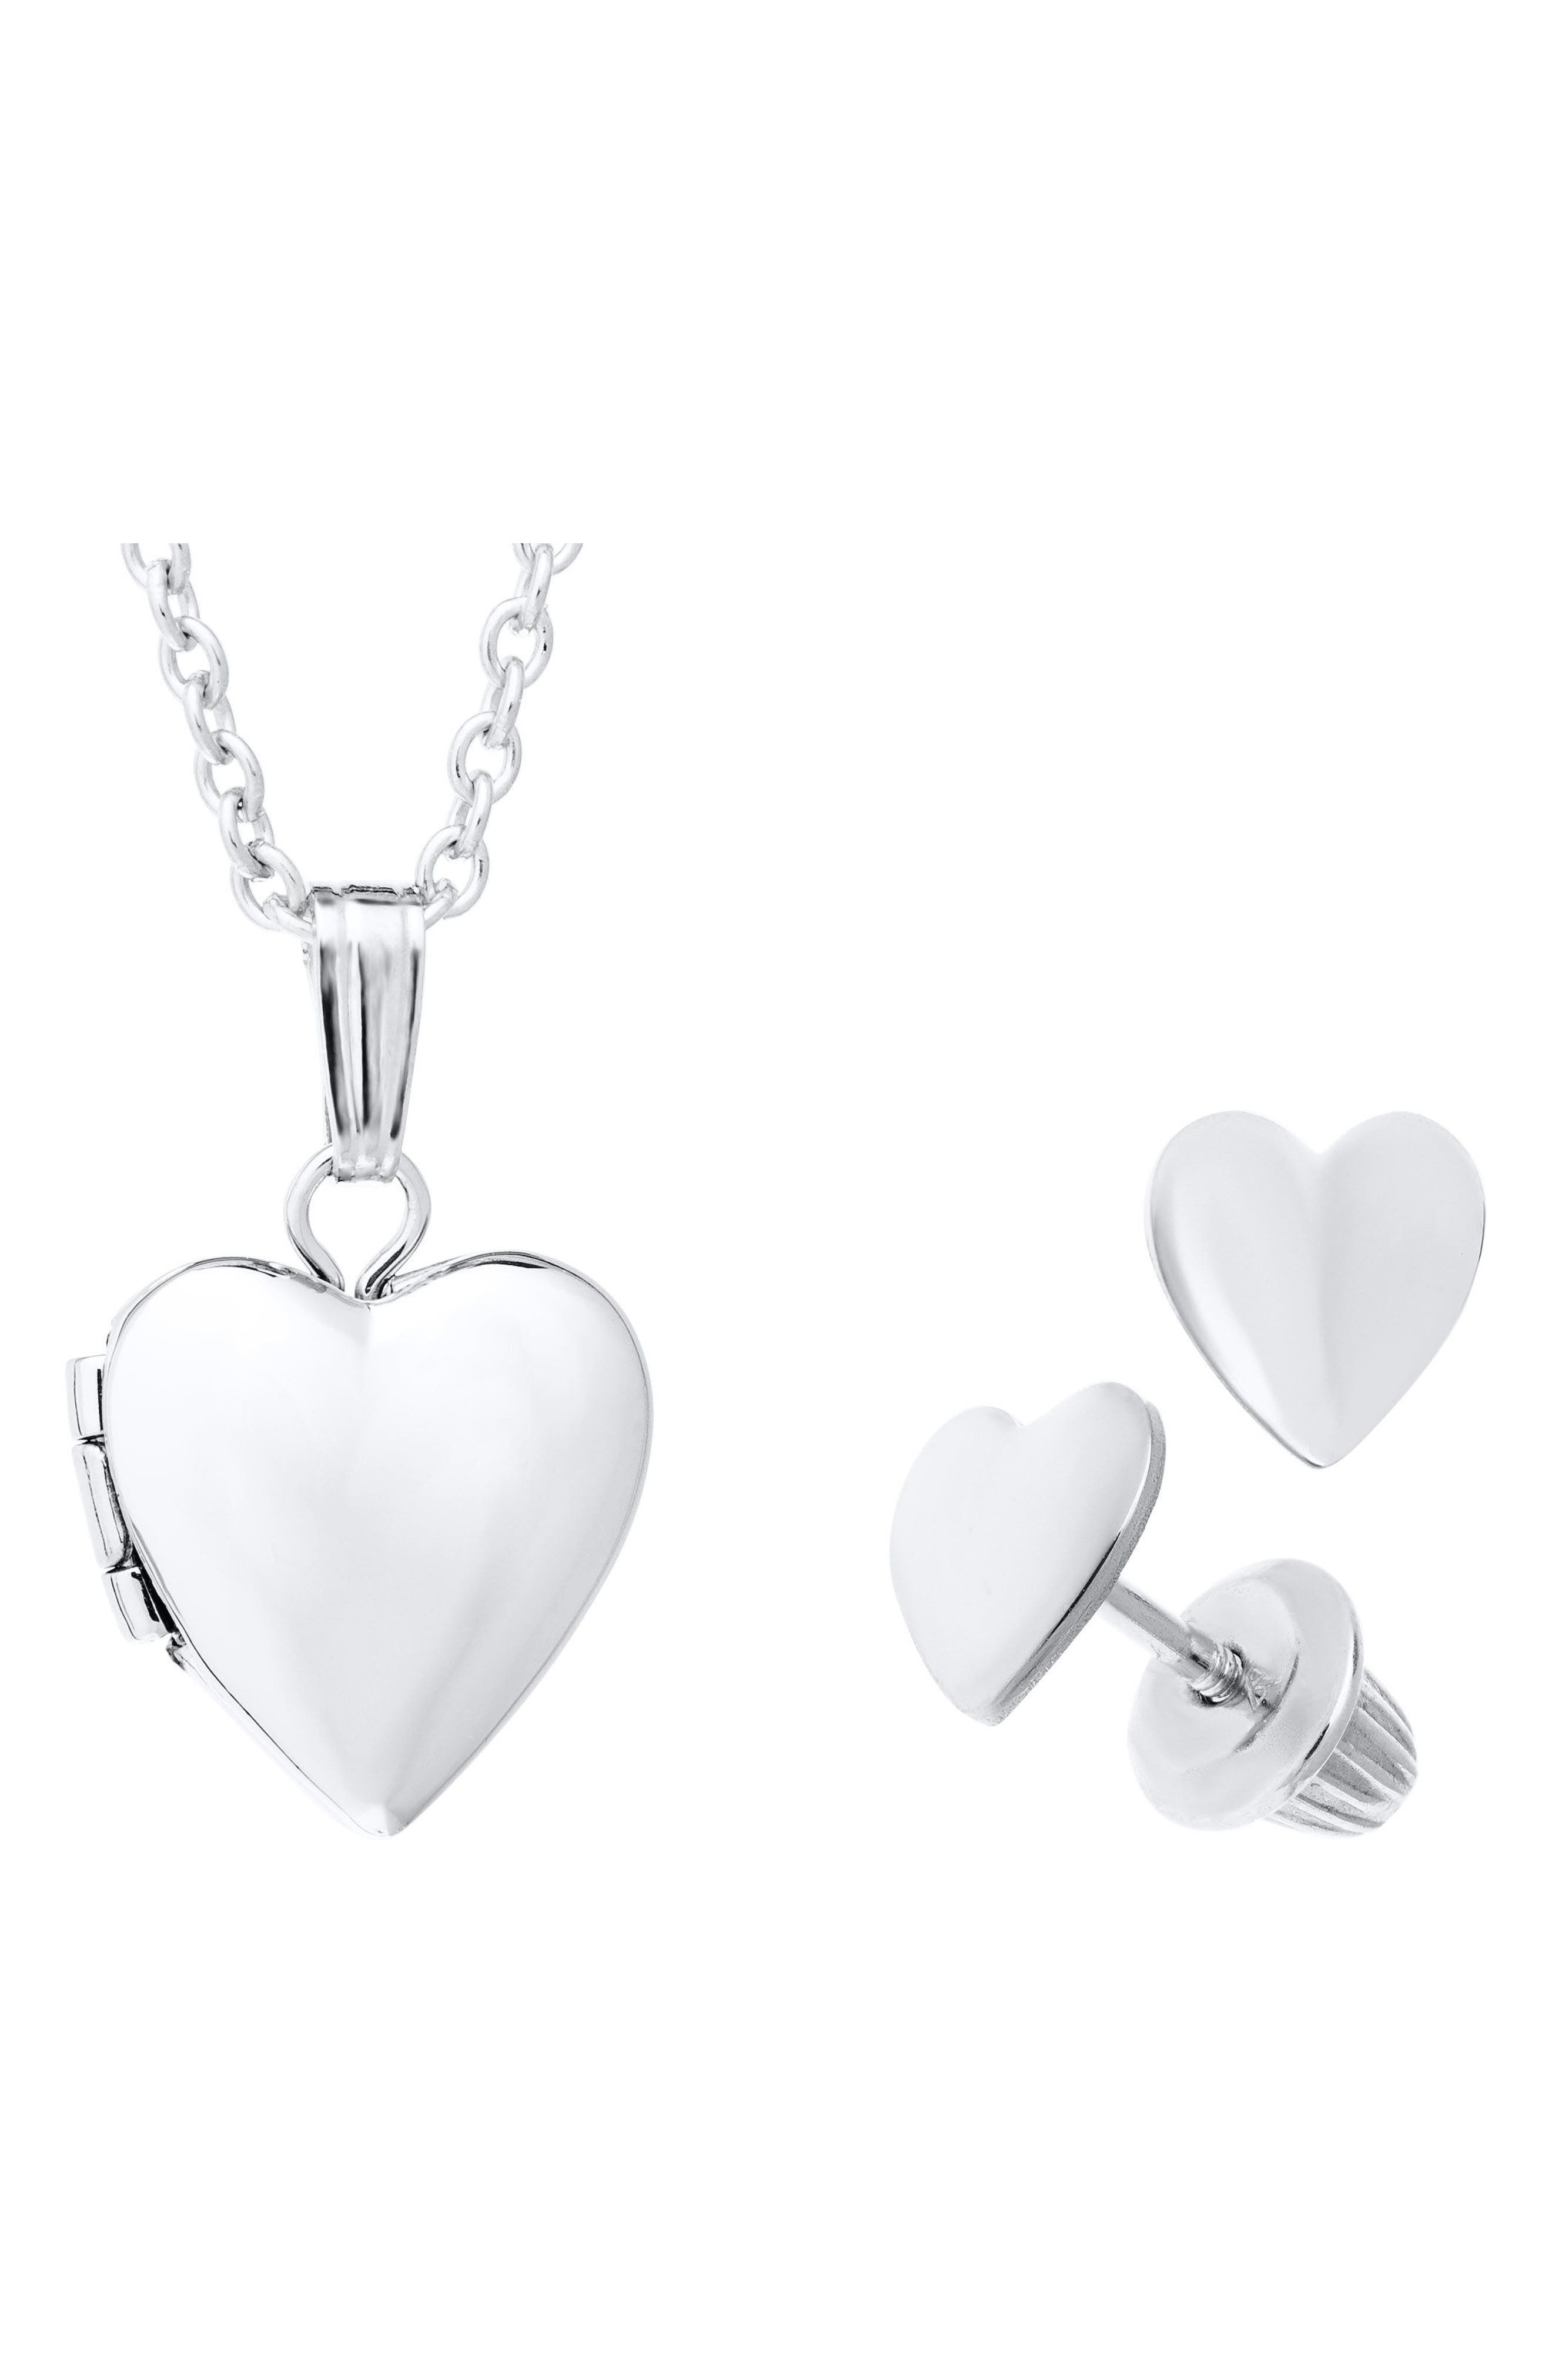 Sterling Silver Heart Locket Necklace & Earrings Set,                         Main,                         color, Silver